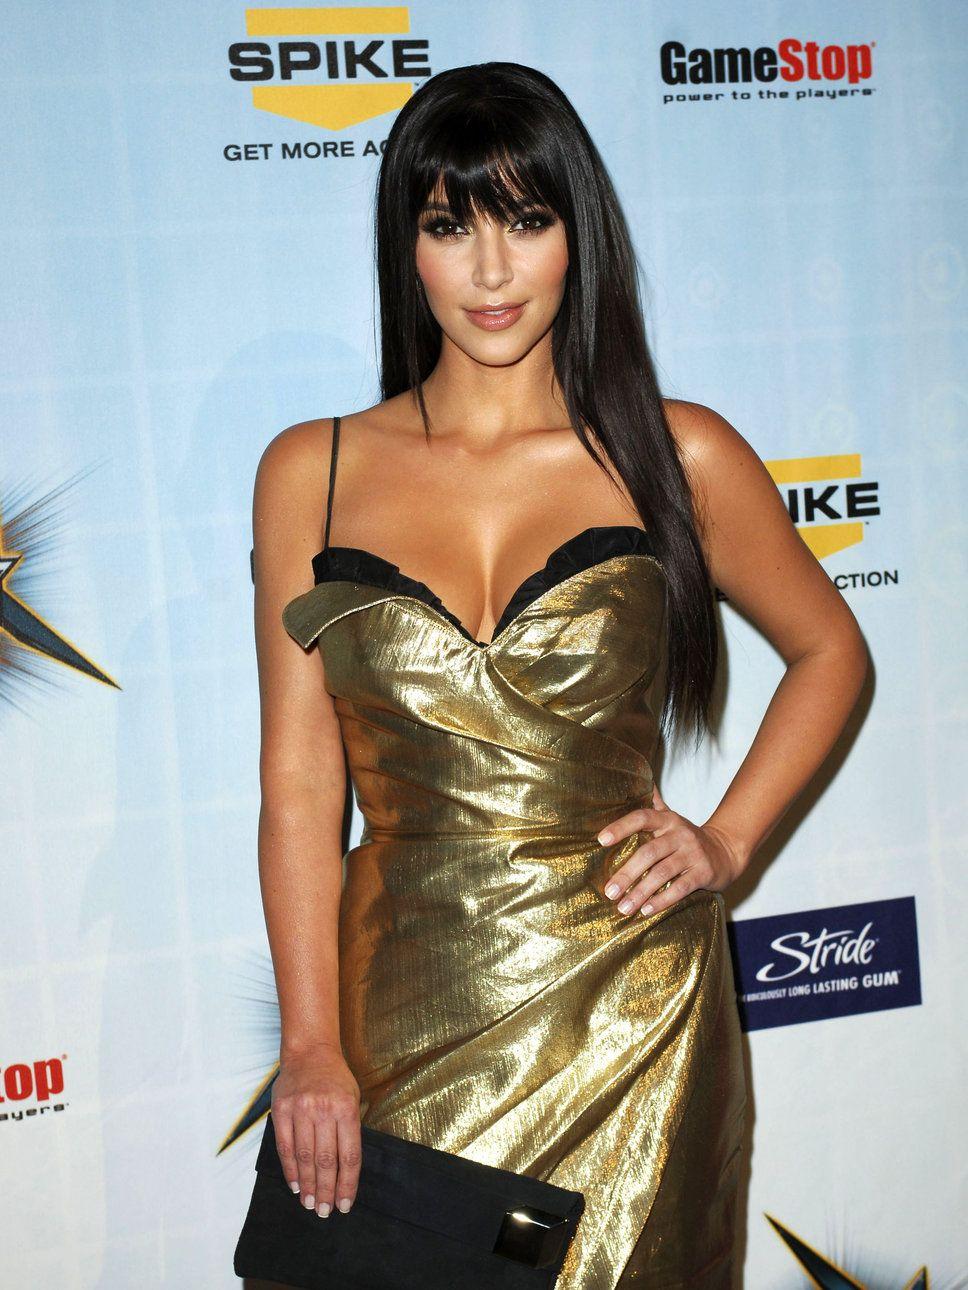 Hot Photo Revealed: Kim Kardashian burns internet in